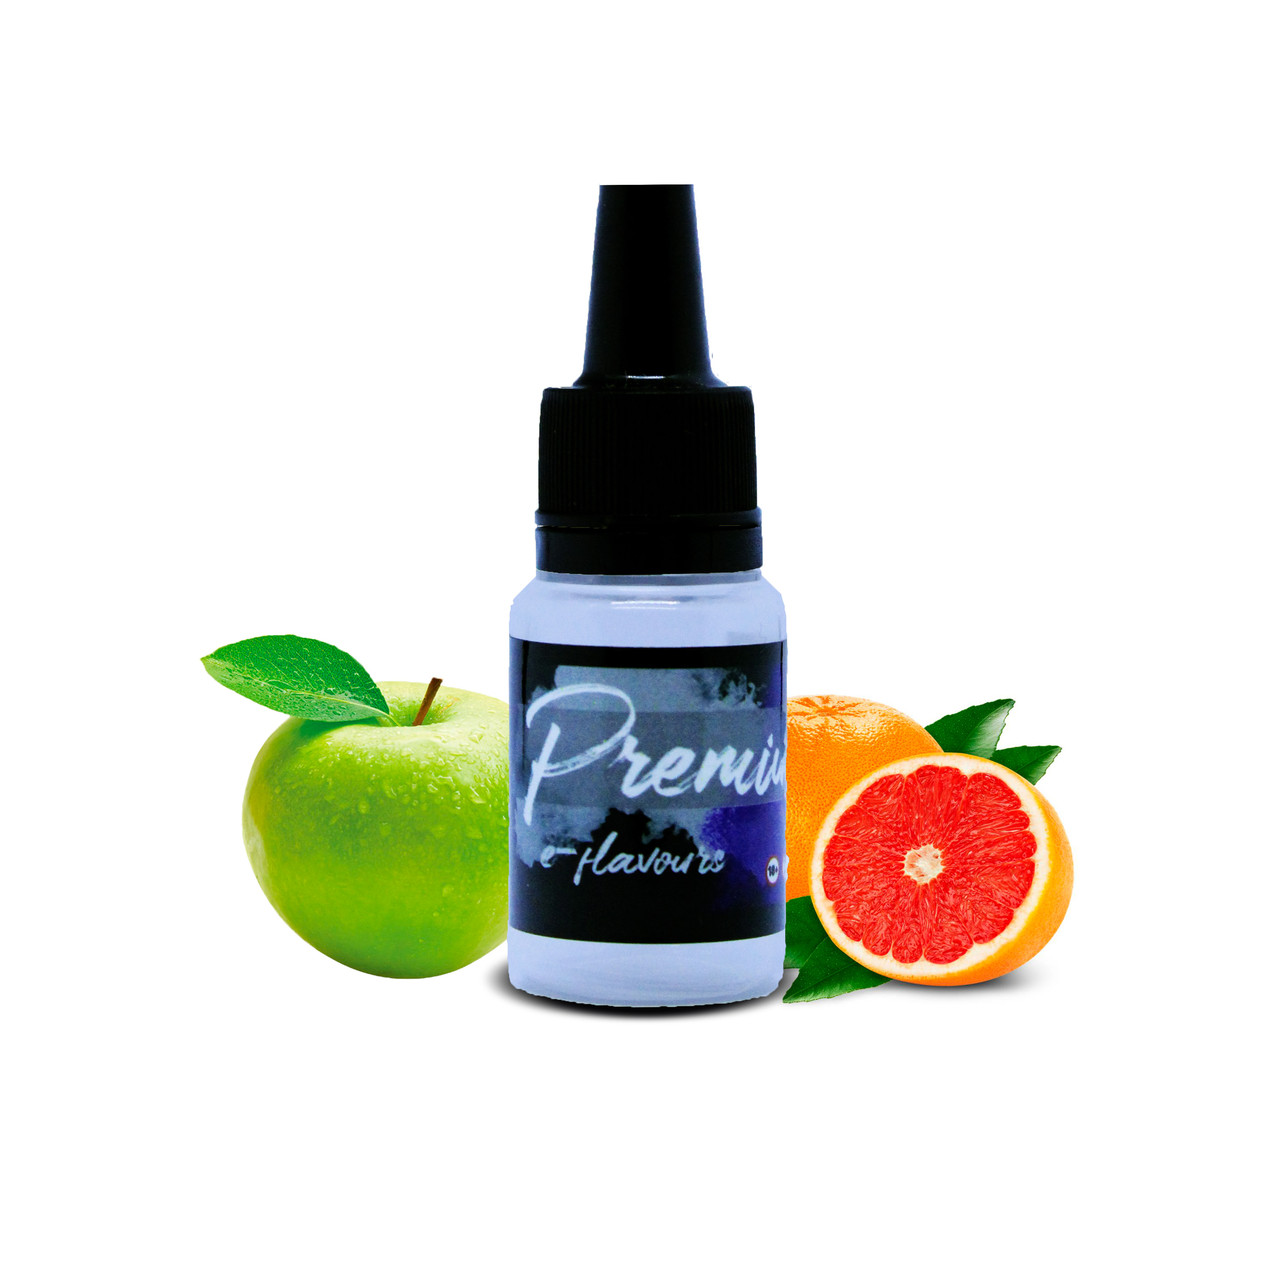 Микс ароматизаторов Грейпфрут и Зеленое яблоко 10 мл